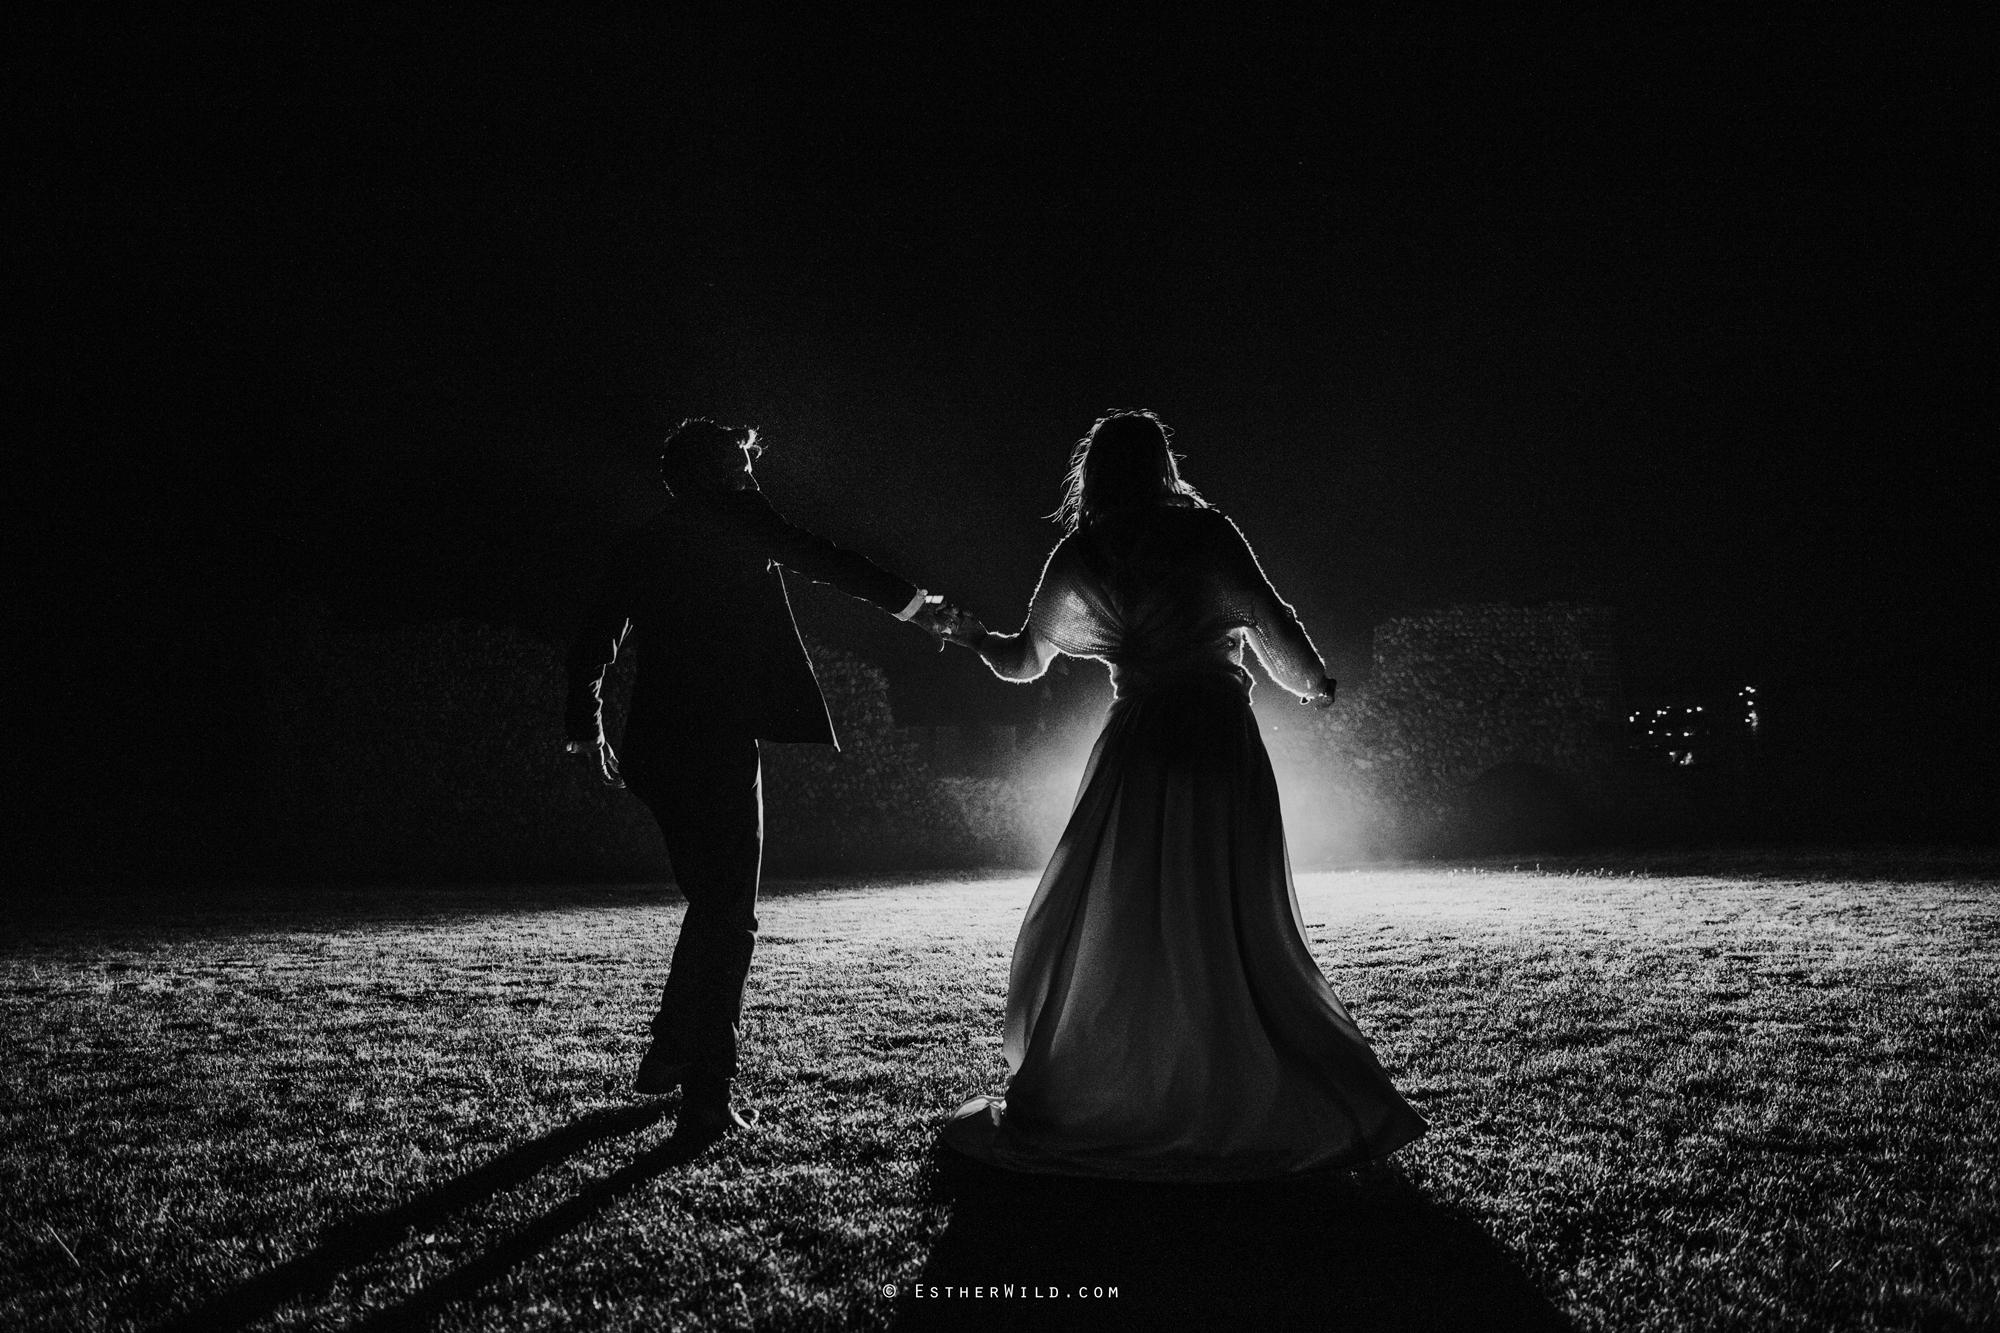 IMG_3681-2Cley_Barn_Drift_Norfolk_Coast_Wedding_Copyright_Esther_Wild_Photographer_.jpg